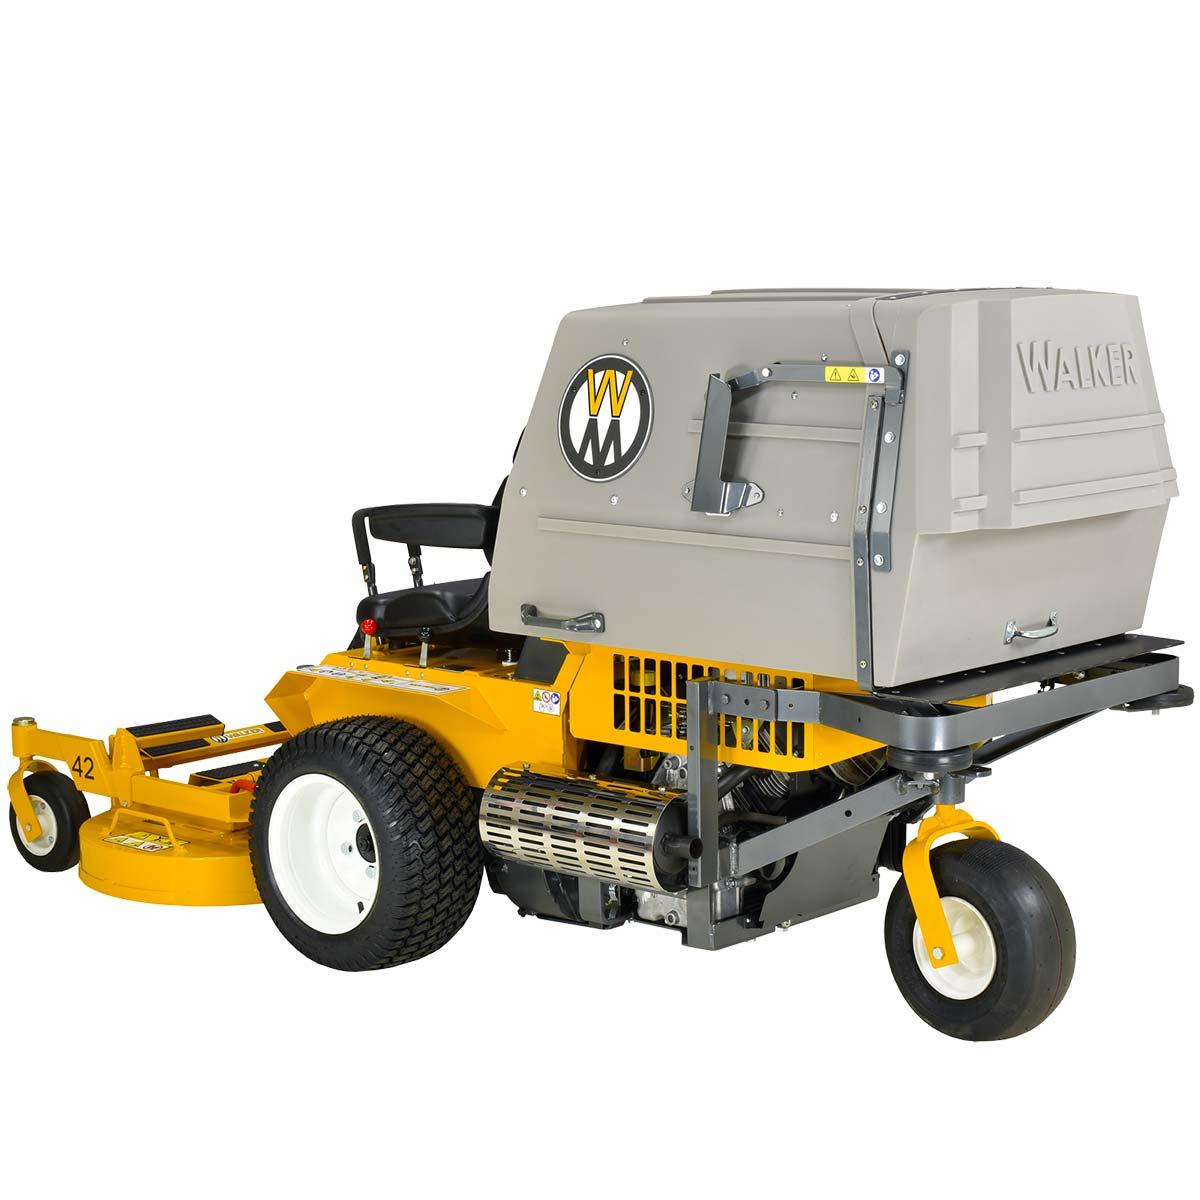 Large rear collection bin for MC19 Walker Mower